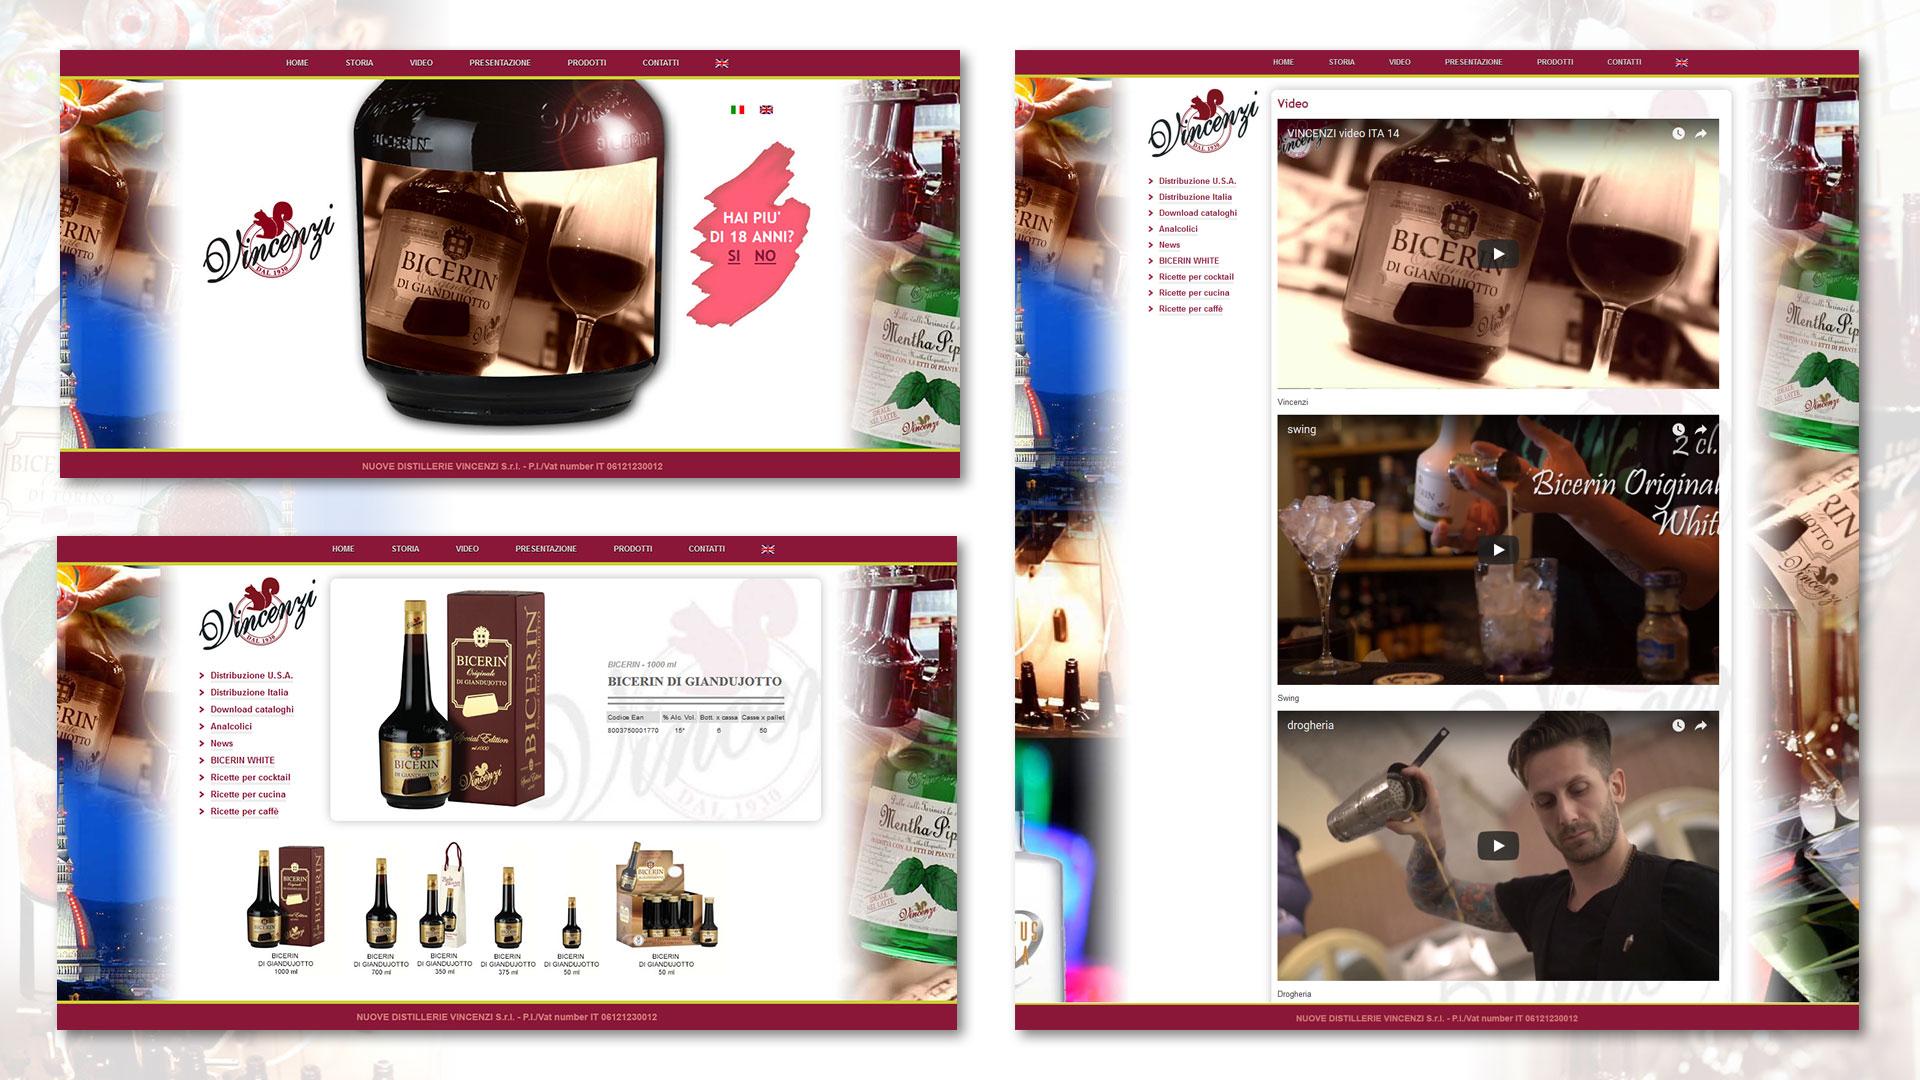 Distillerie Vincenzi